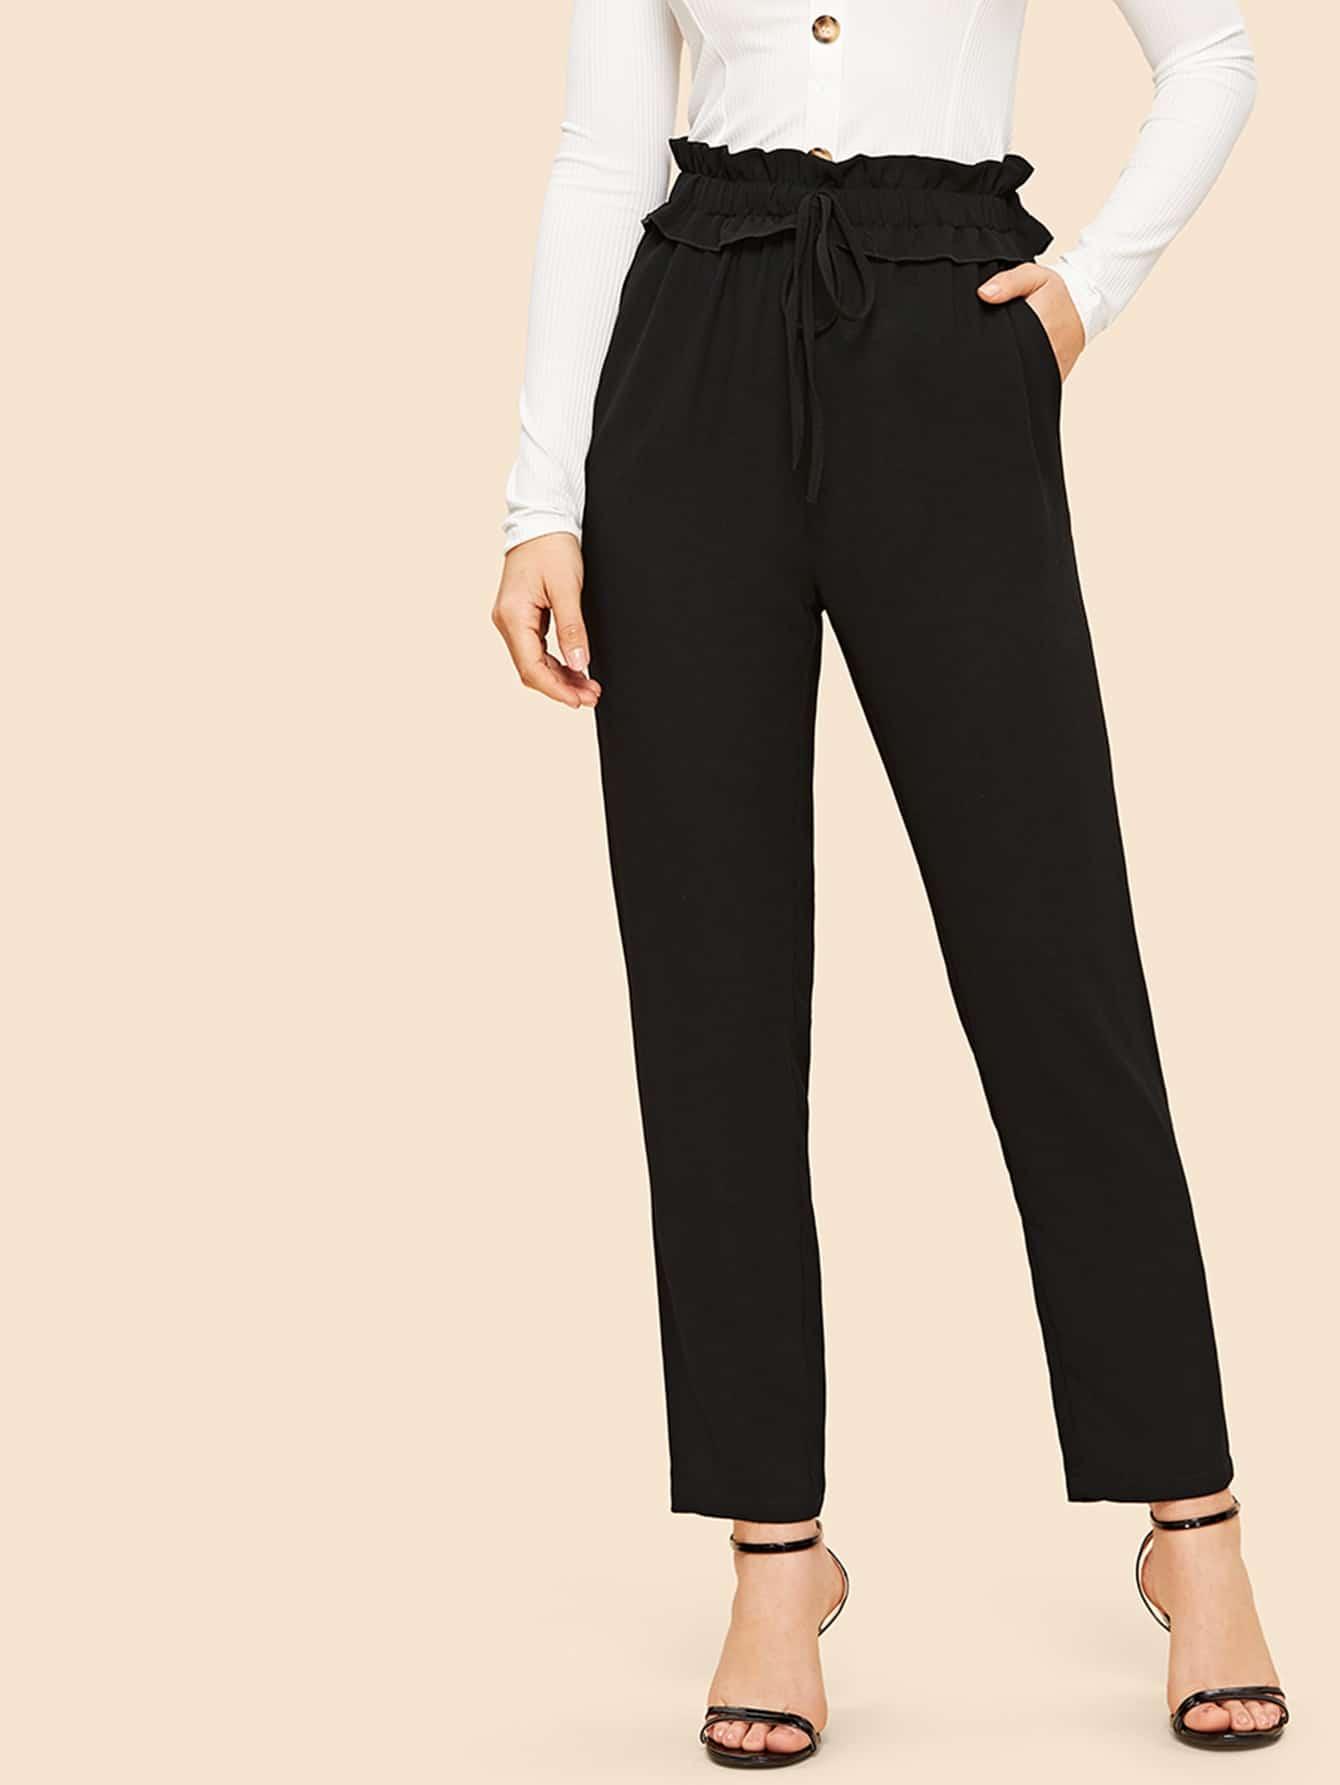 70s брюки с косами карманами и плиссированной талией thumbnail